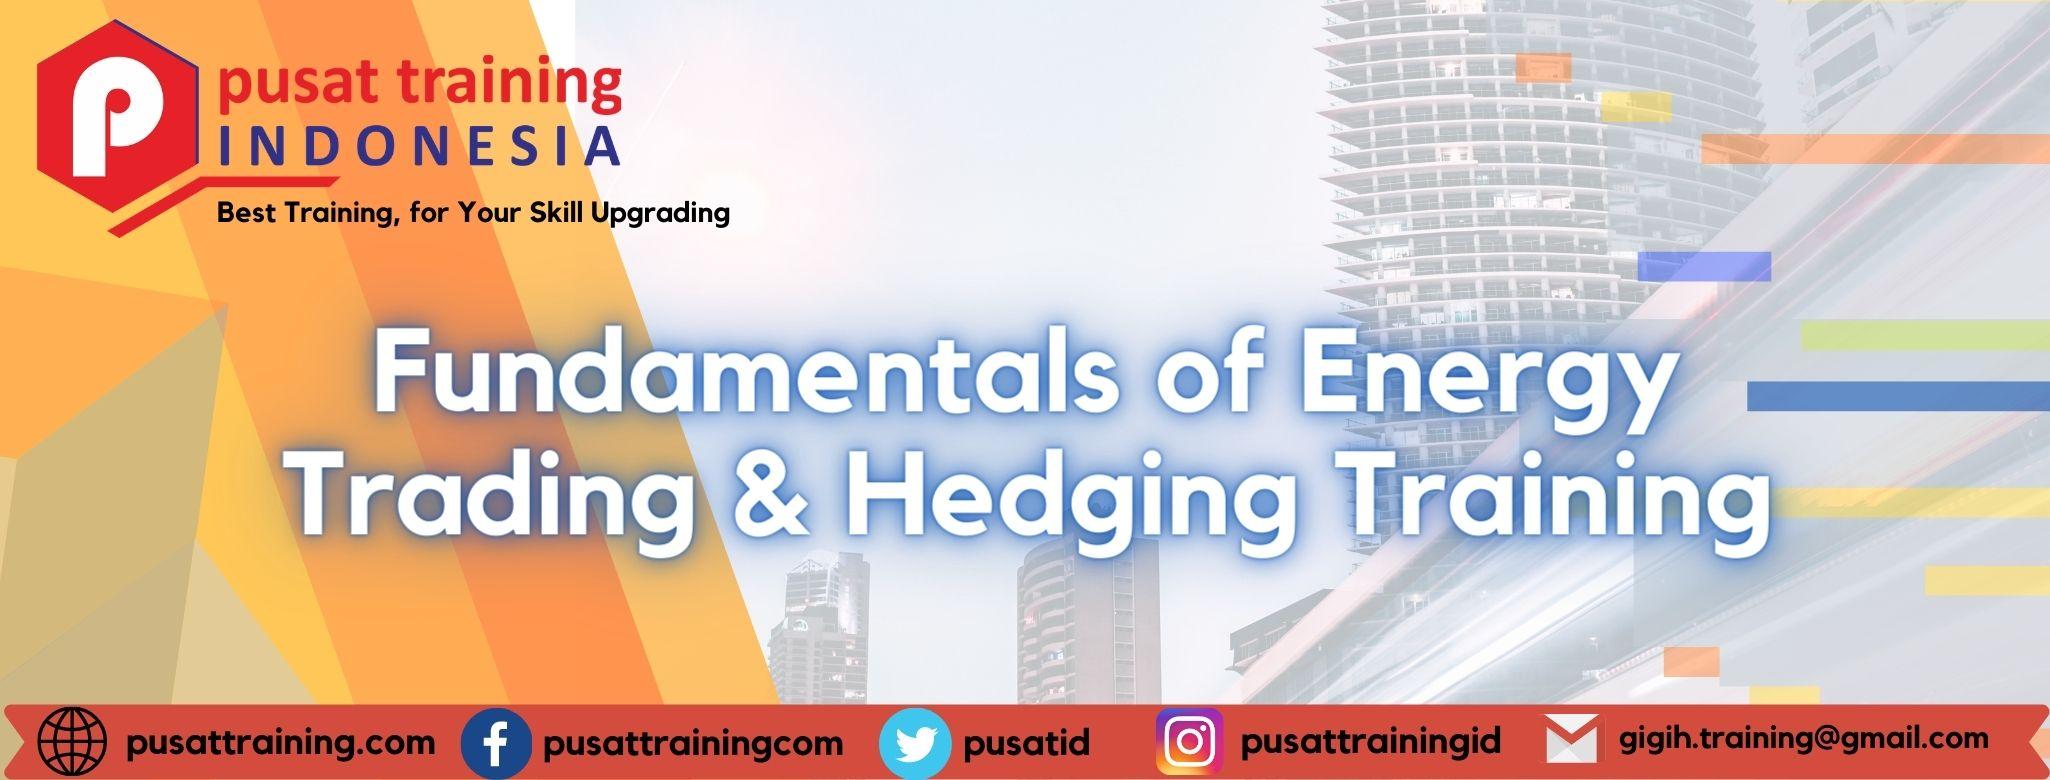 fundamentals-of-energy-trading-hedging-training